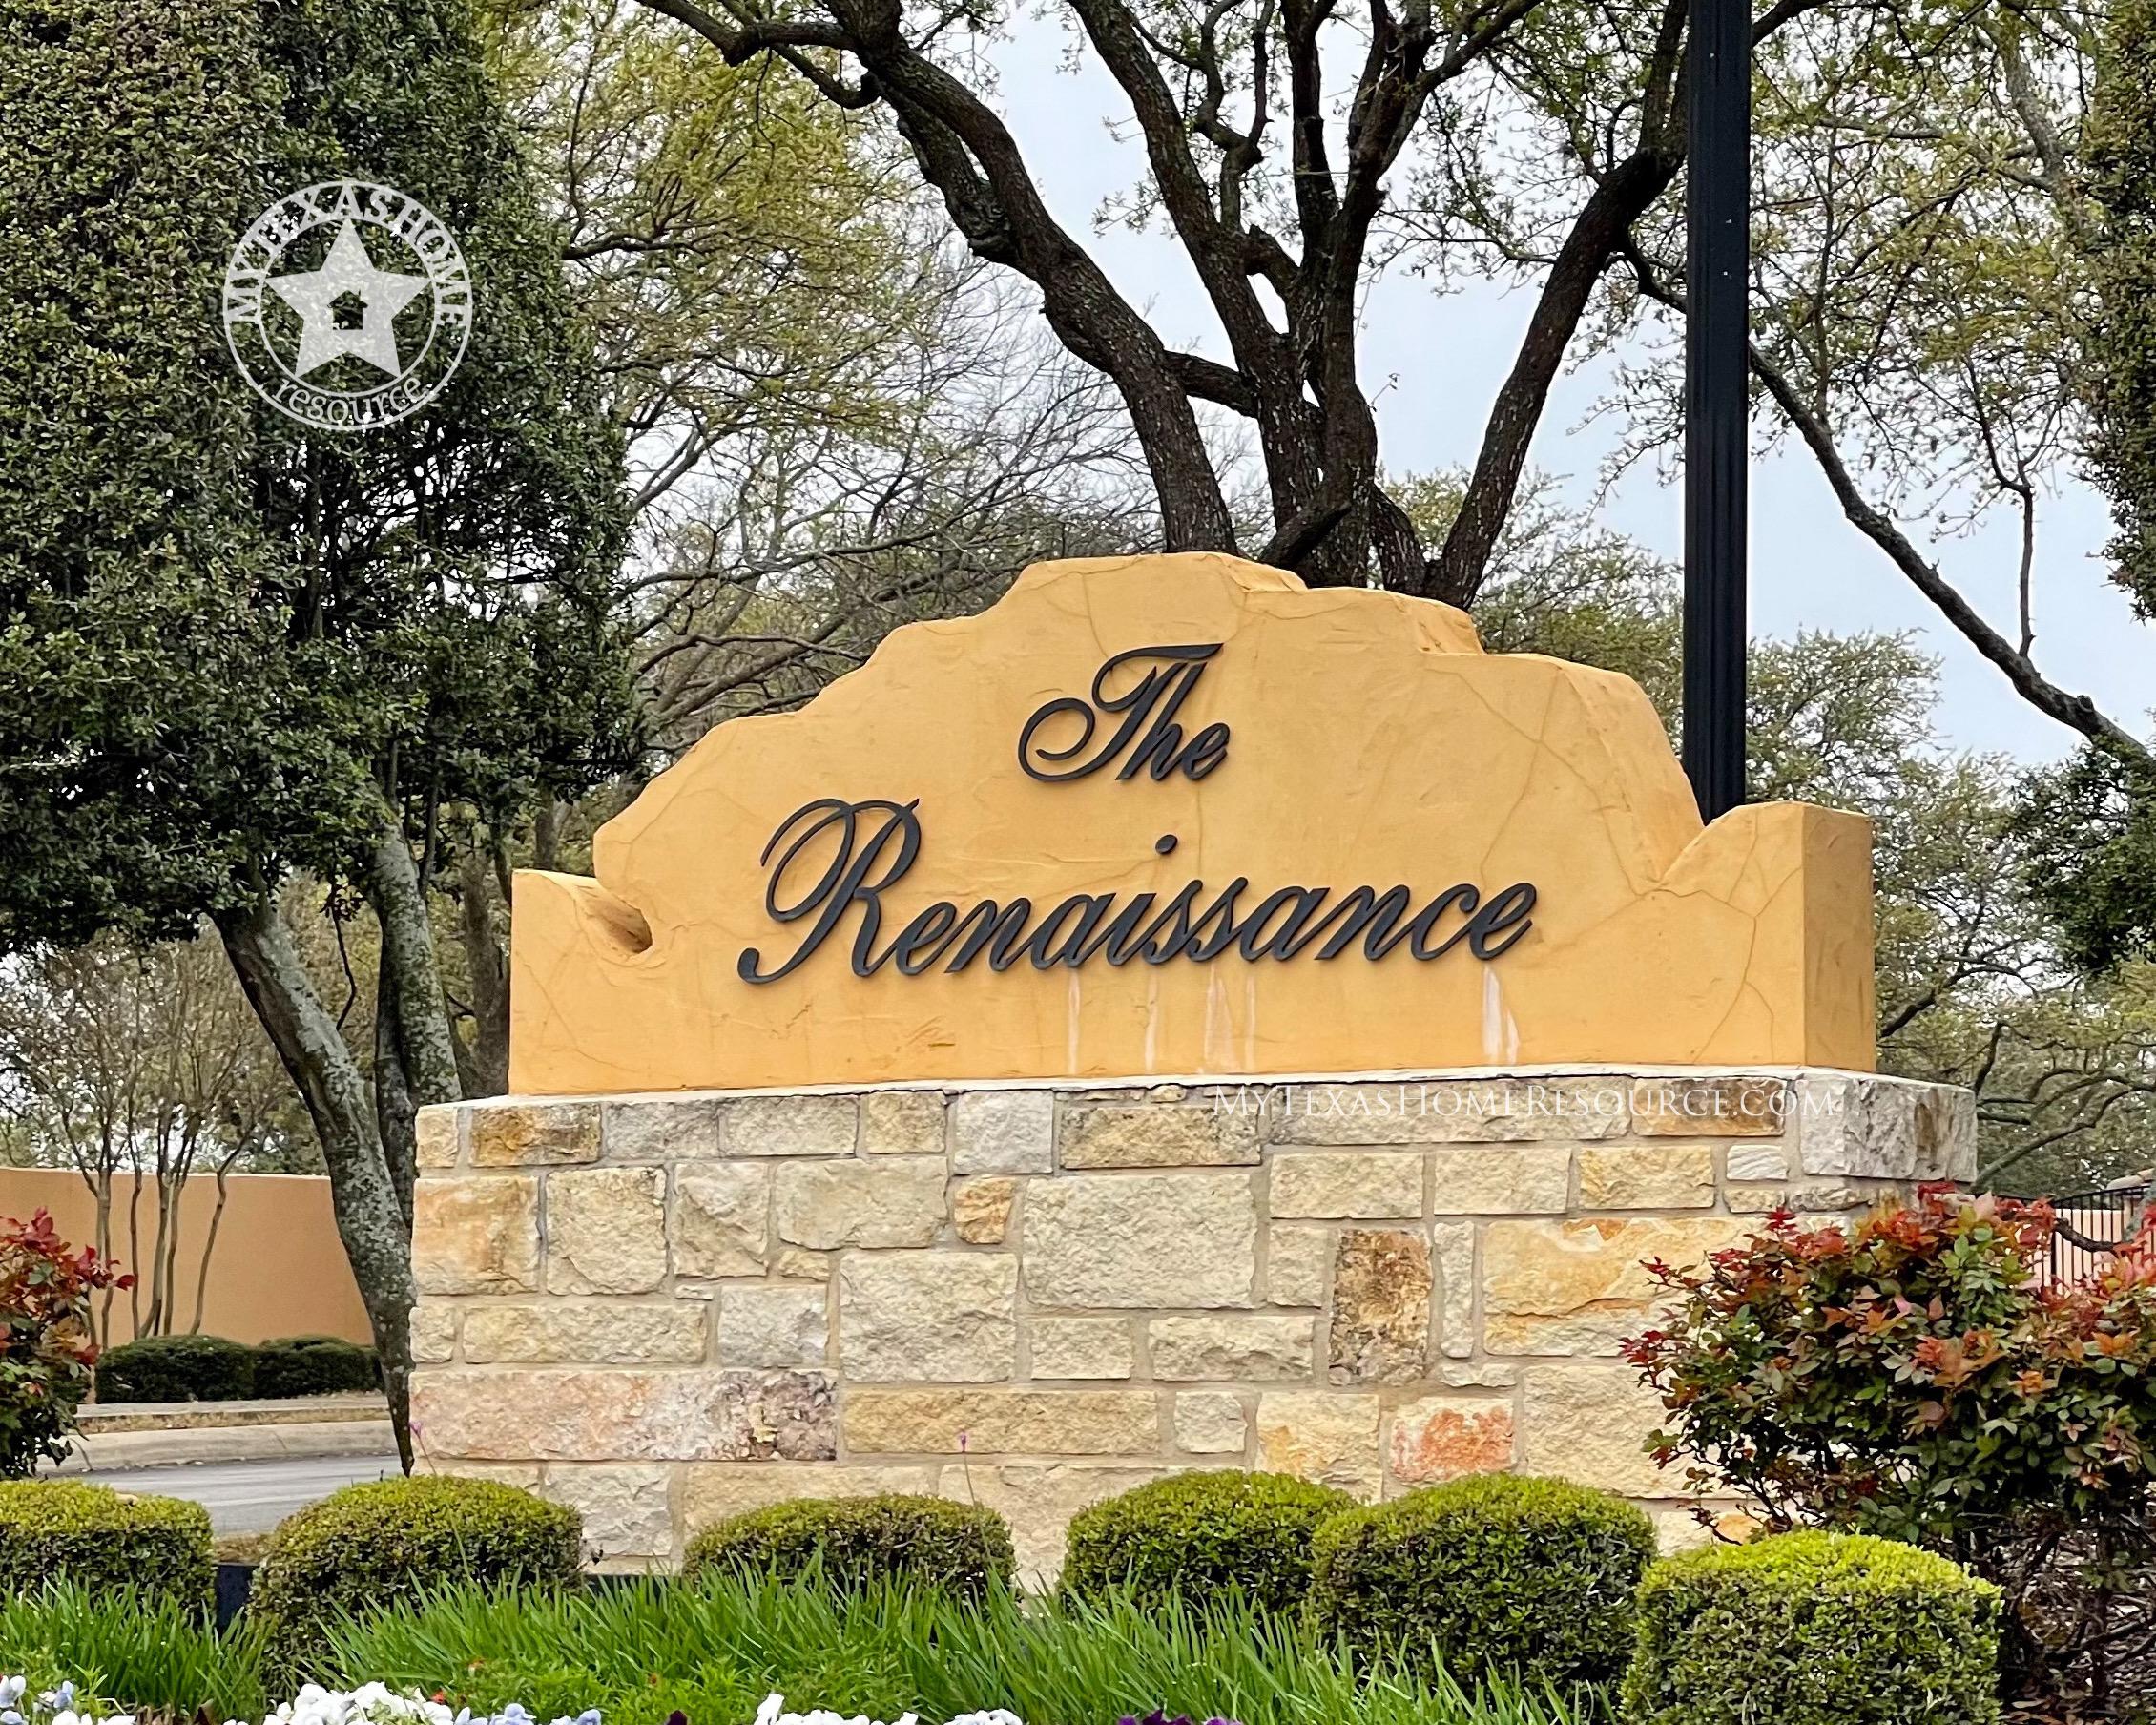 Renaissance at the Dominion Community San Antonio, TX